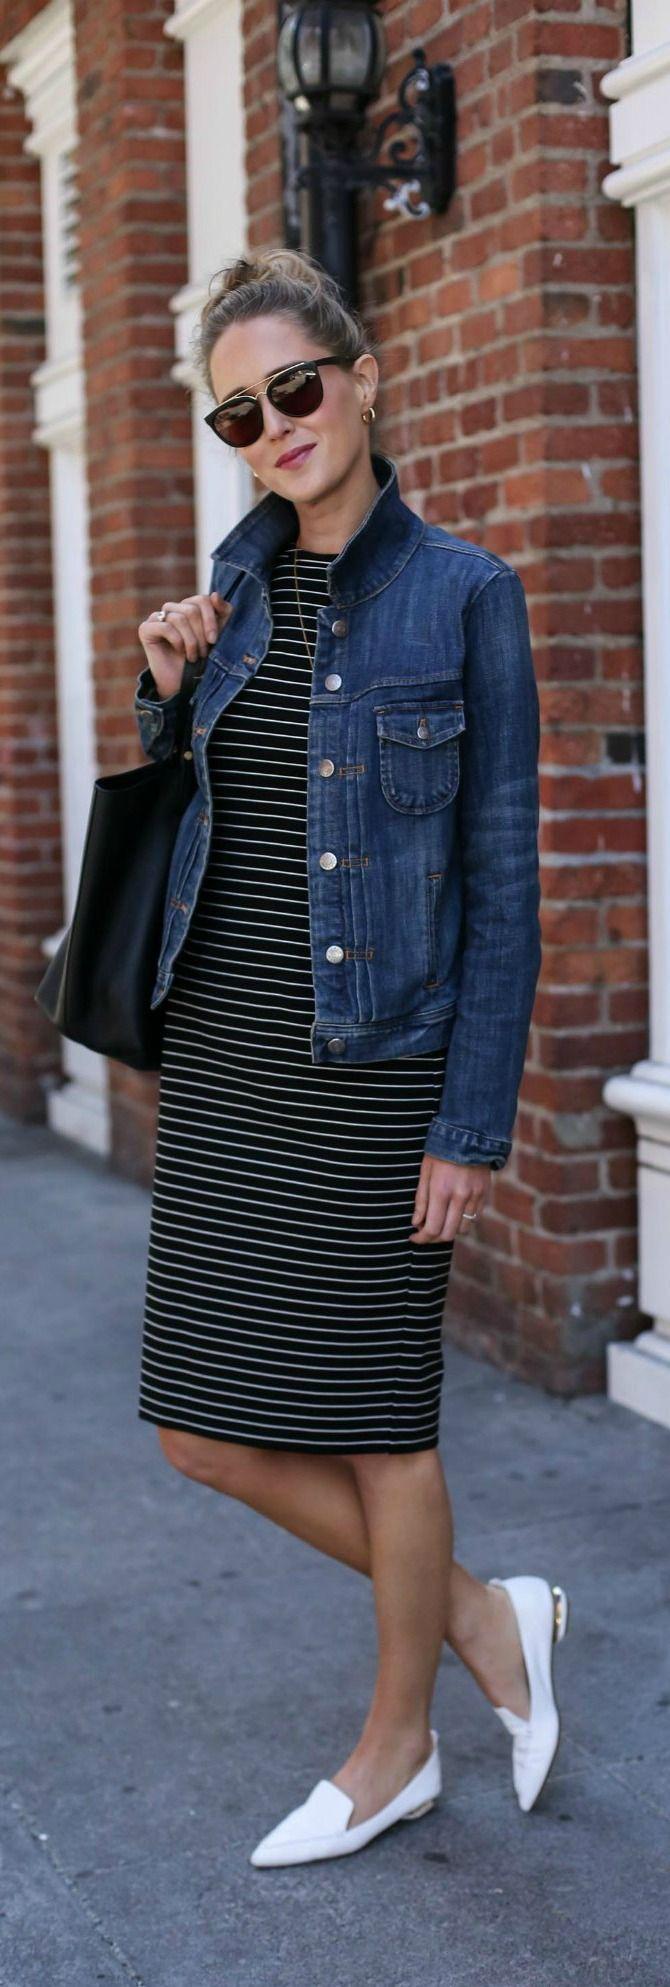 Striped Midi Sheath Dress Denim Jacket White Pointed Toe Loafers Black Tote Bag Gold Lariat Necklace Black Sunglasses M Fashion Outfits Fabulous Clothes [ 1987 x 670 Pixel ]